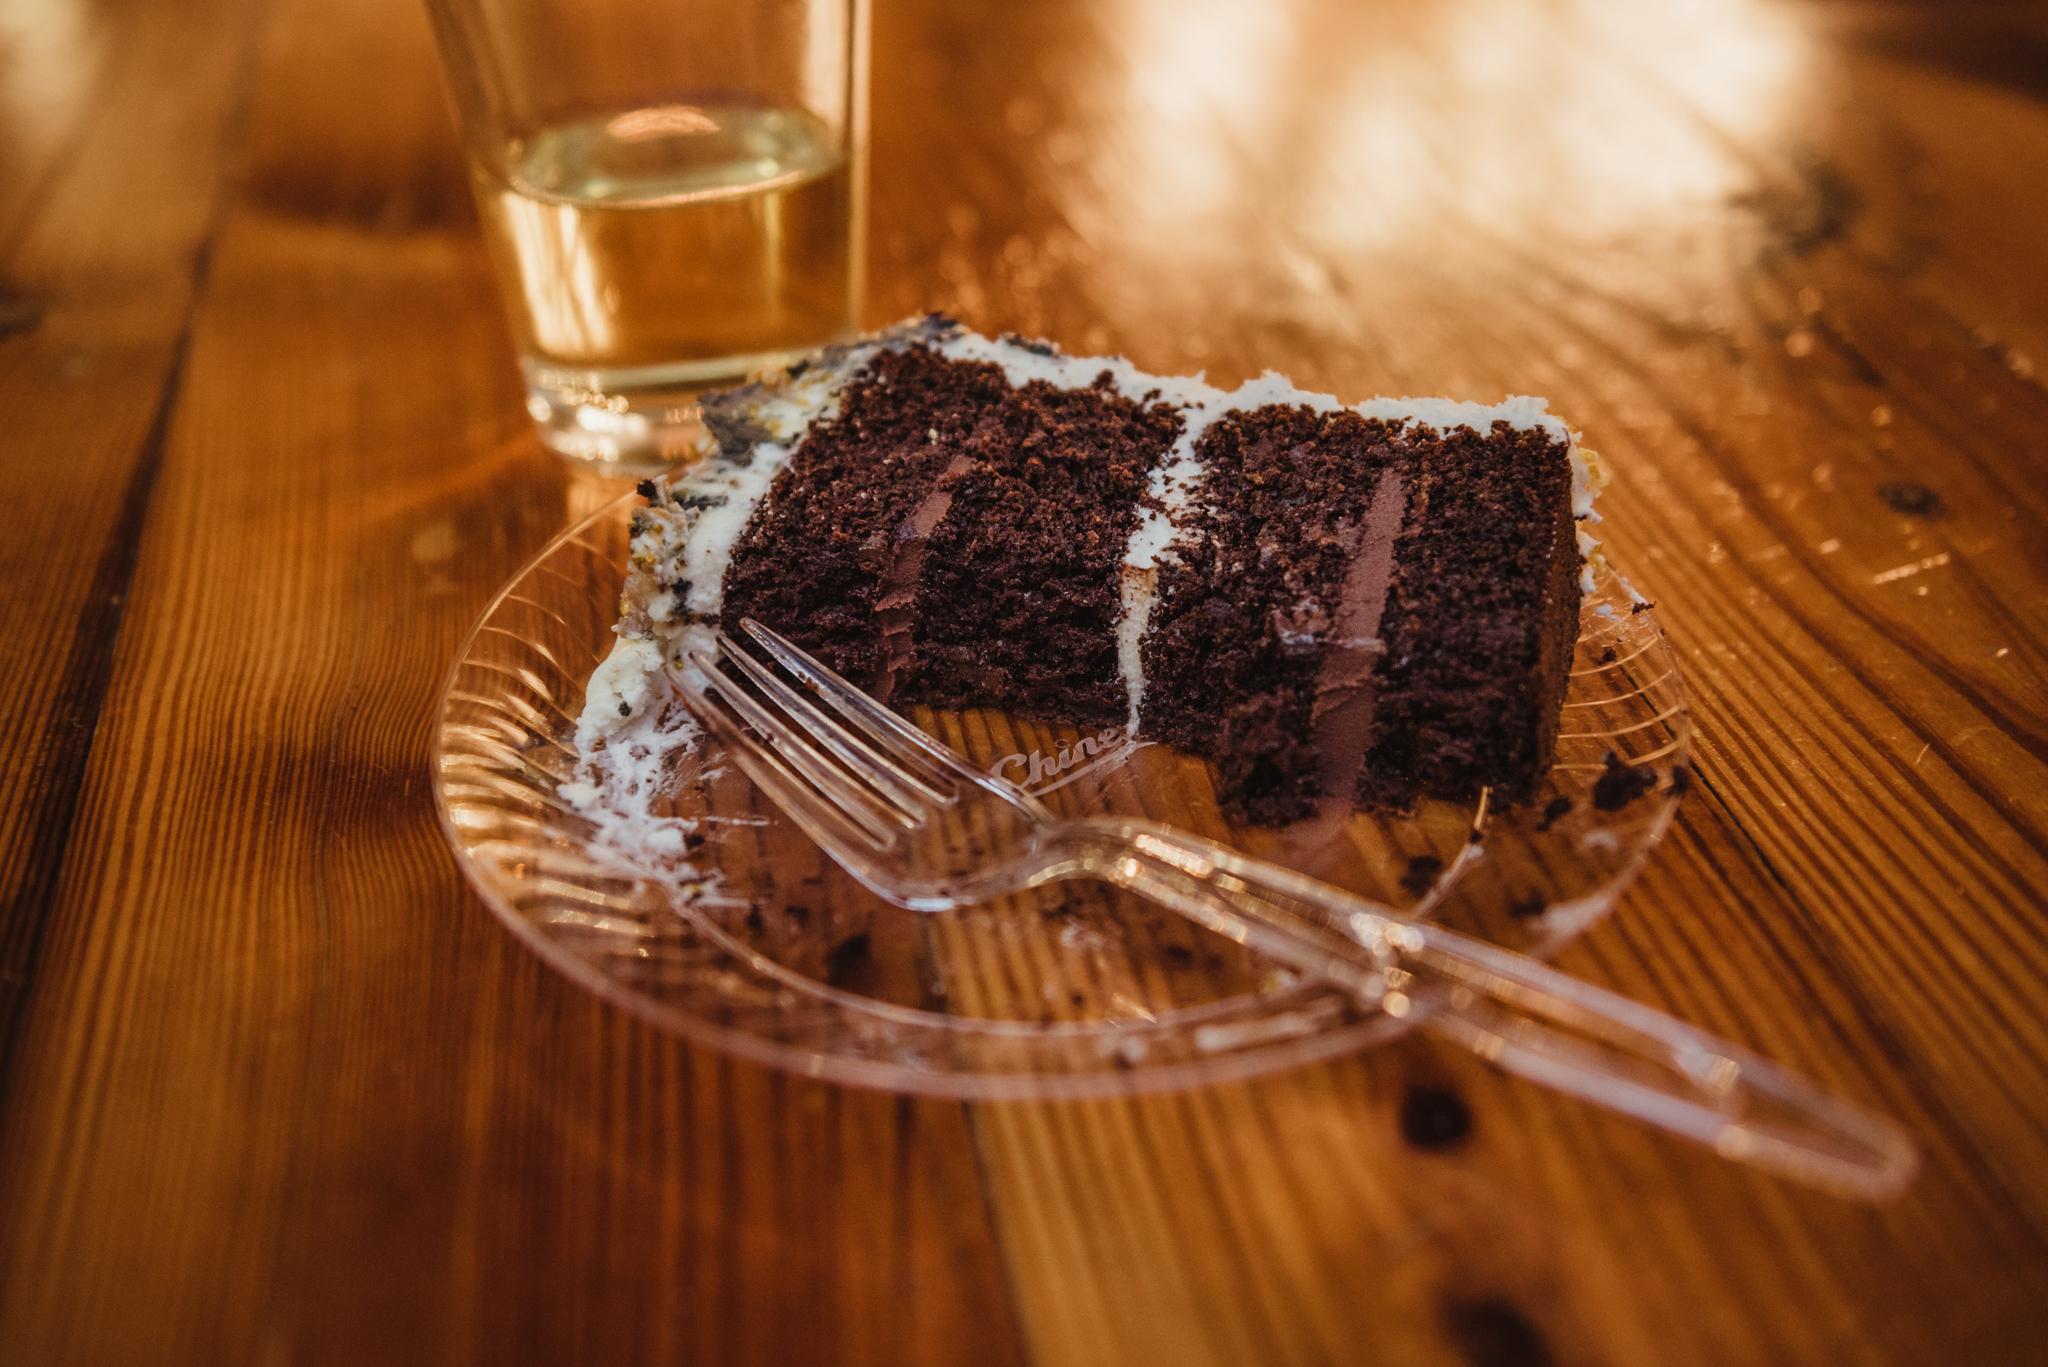 half-eaten-chocolate-wedding-cake-and-hard-cider.jpg